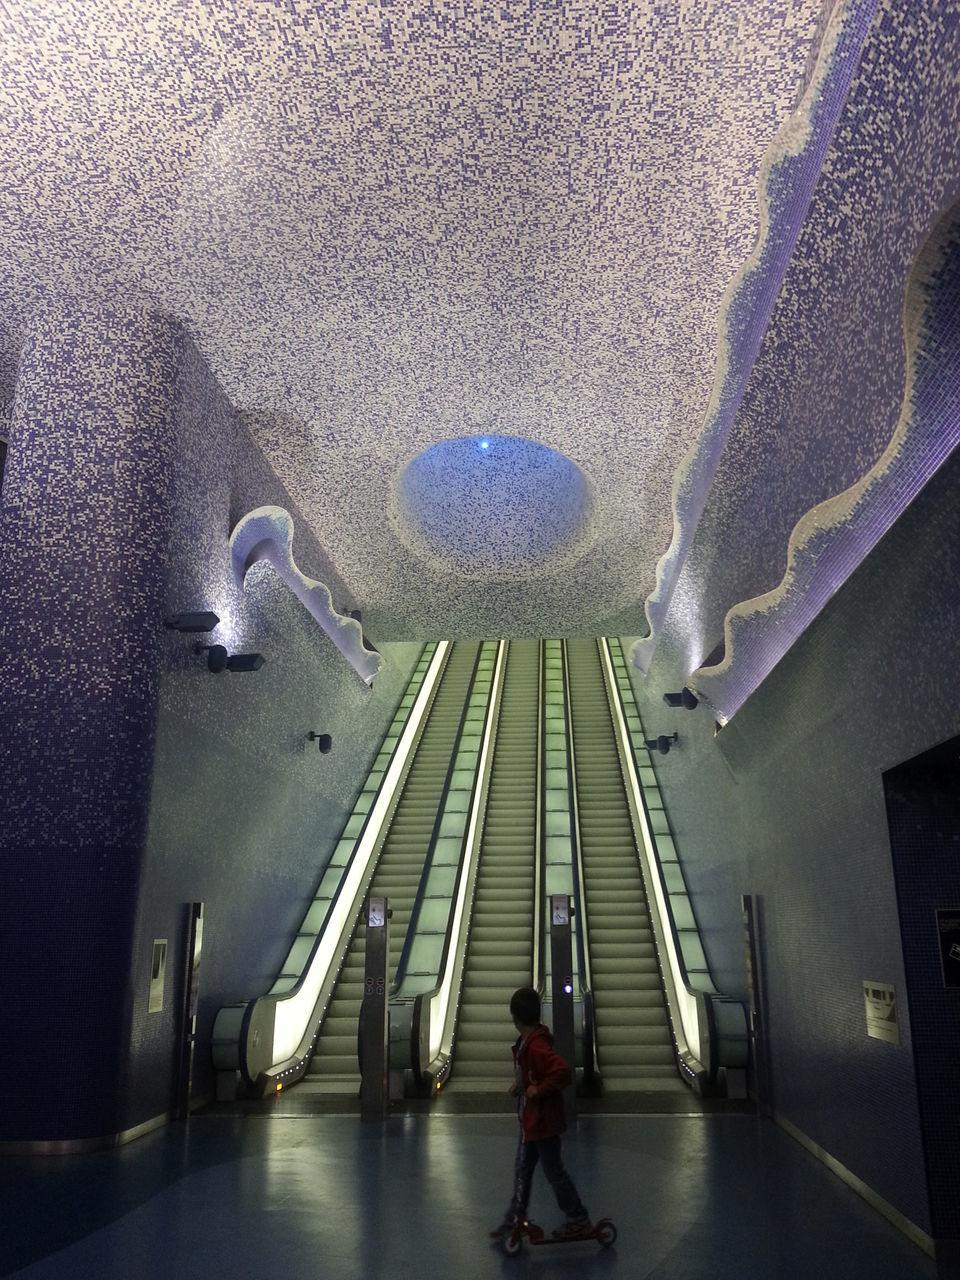 Boy By Illuminated Escalator In Modern Building